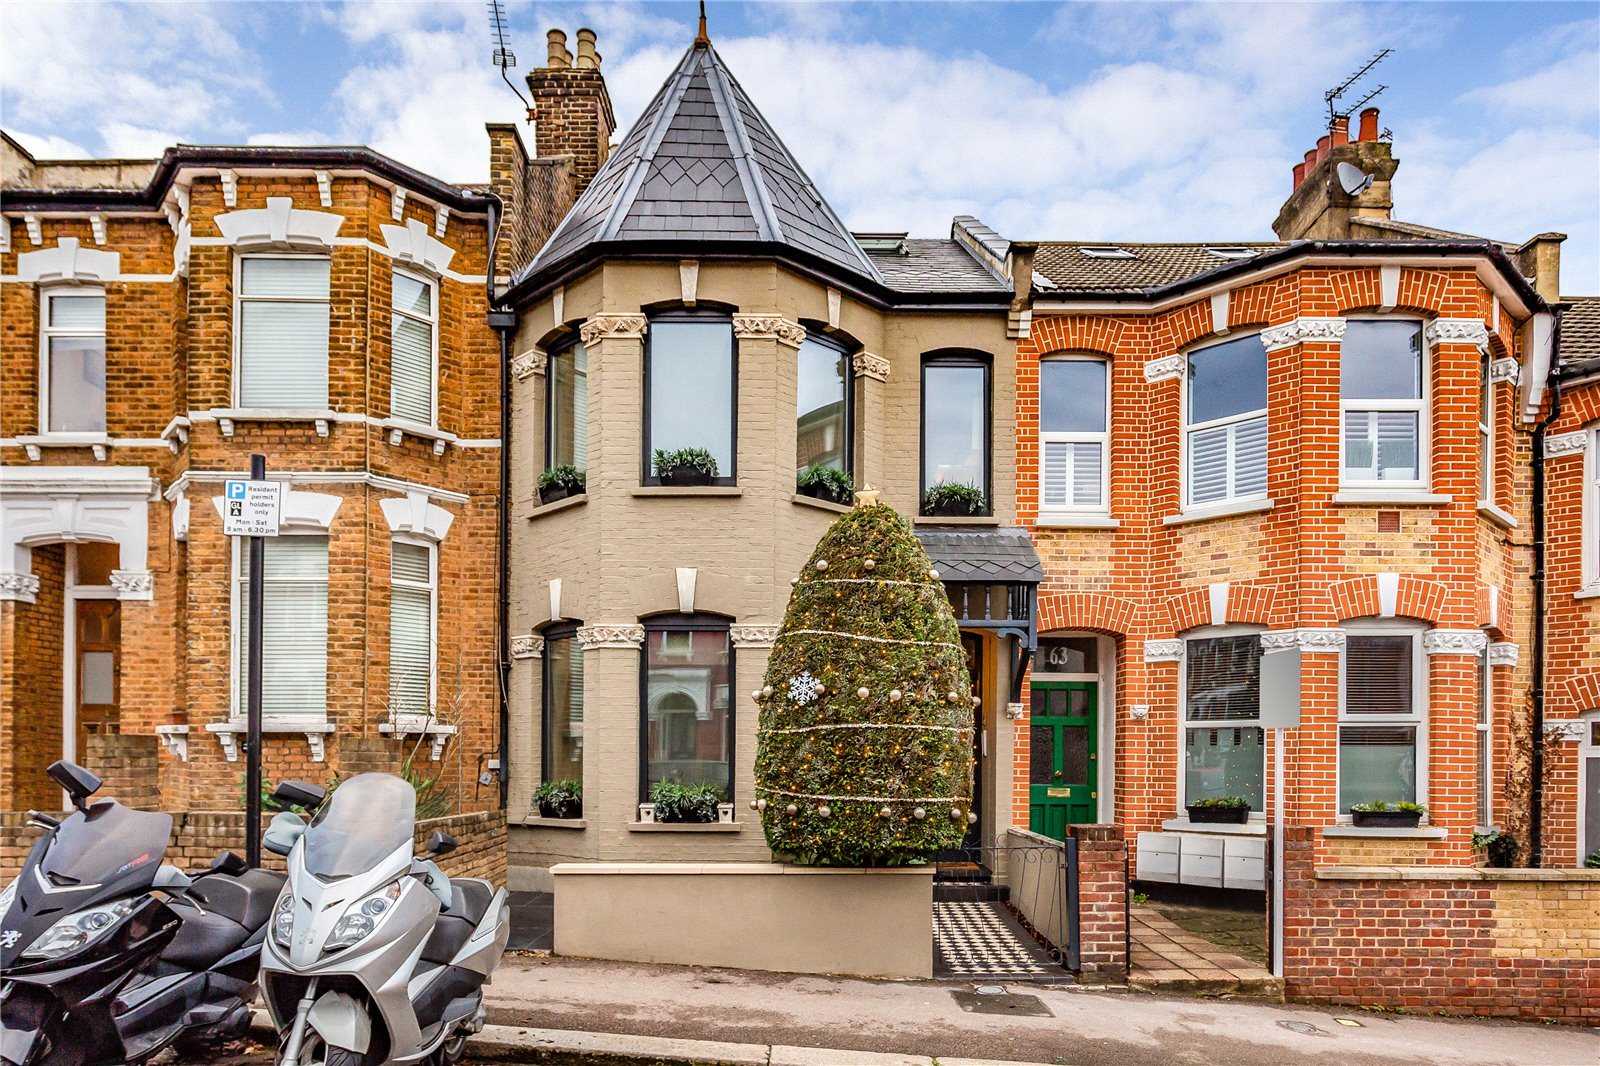 5 bed terraced house for sale in Duckett Road, London N4 - Zoopla